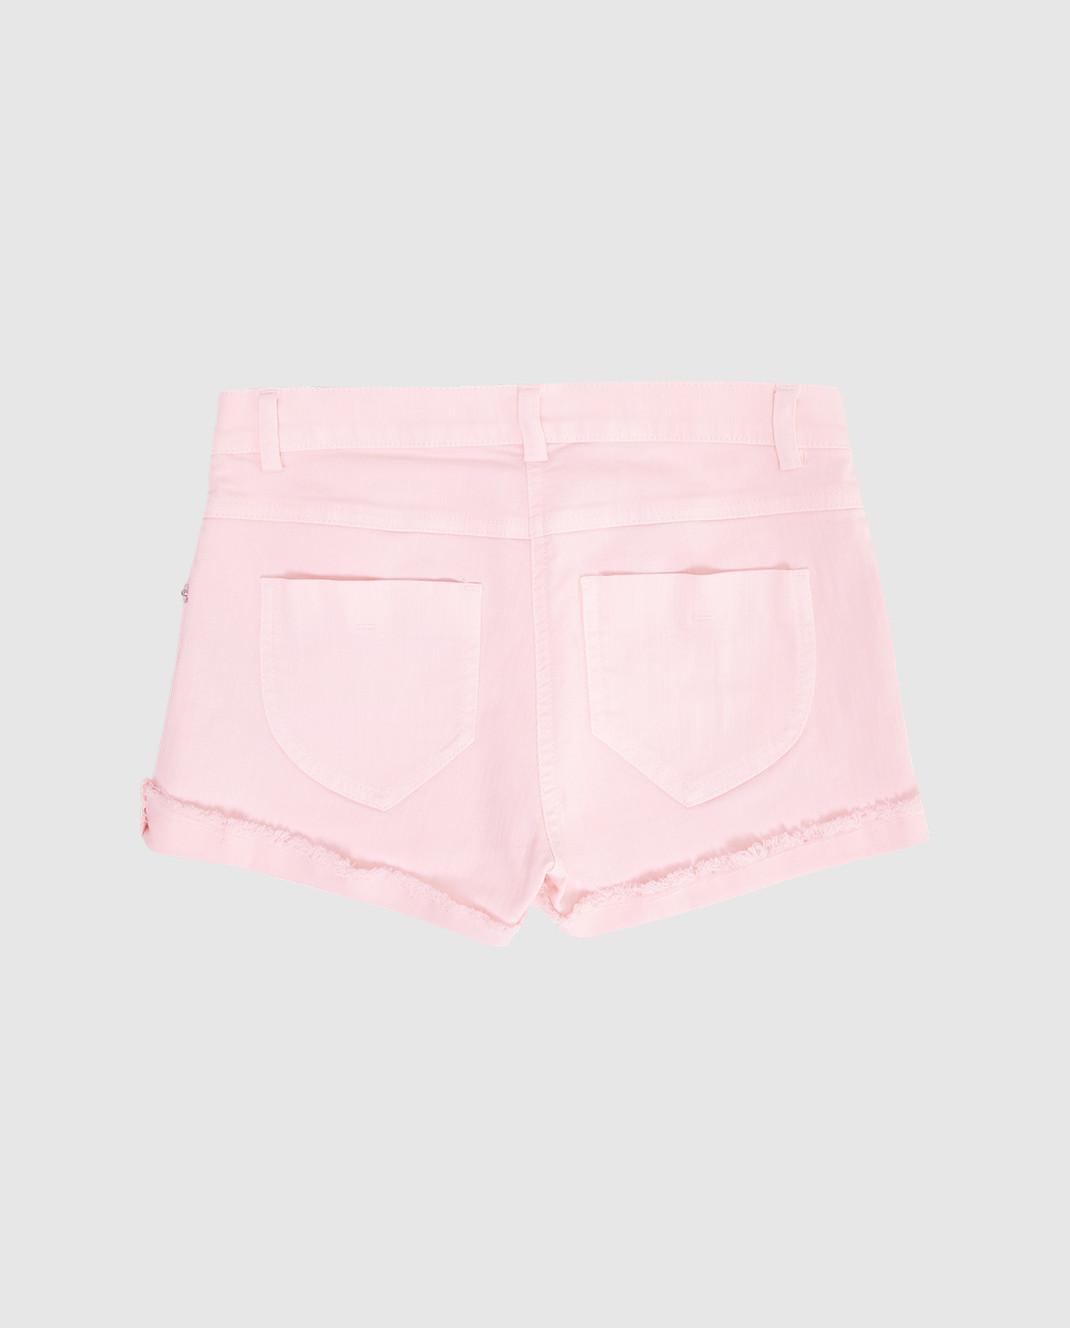 Ermanno Scervino Детские розовые шорты PC061014 изображение 2